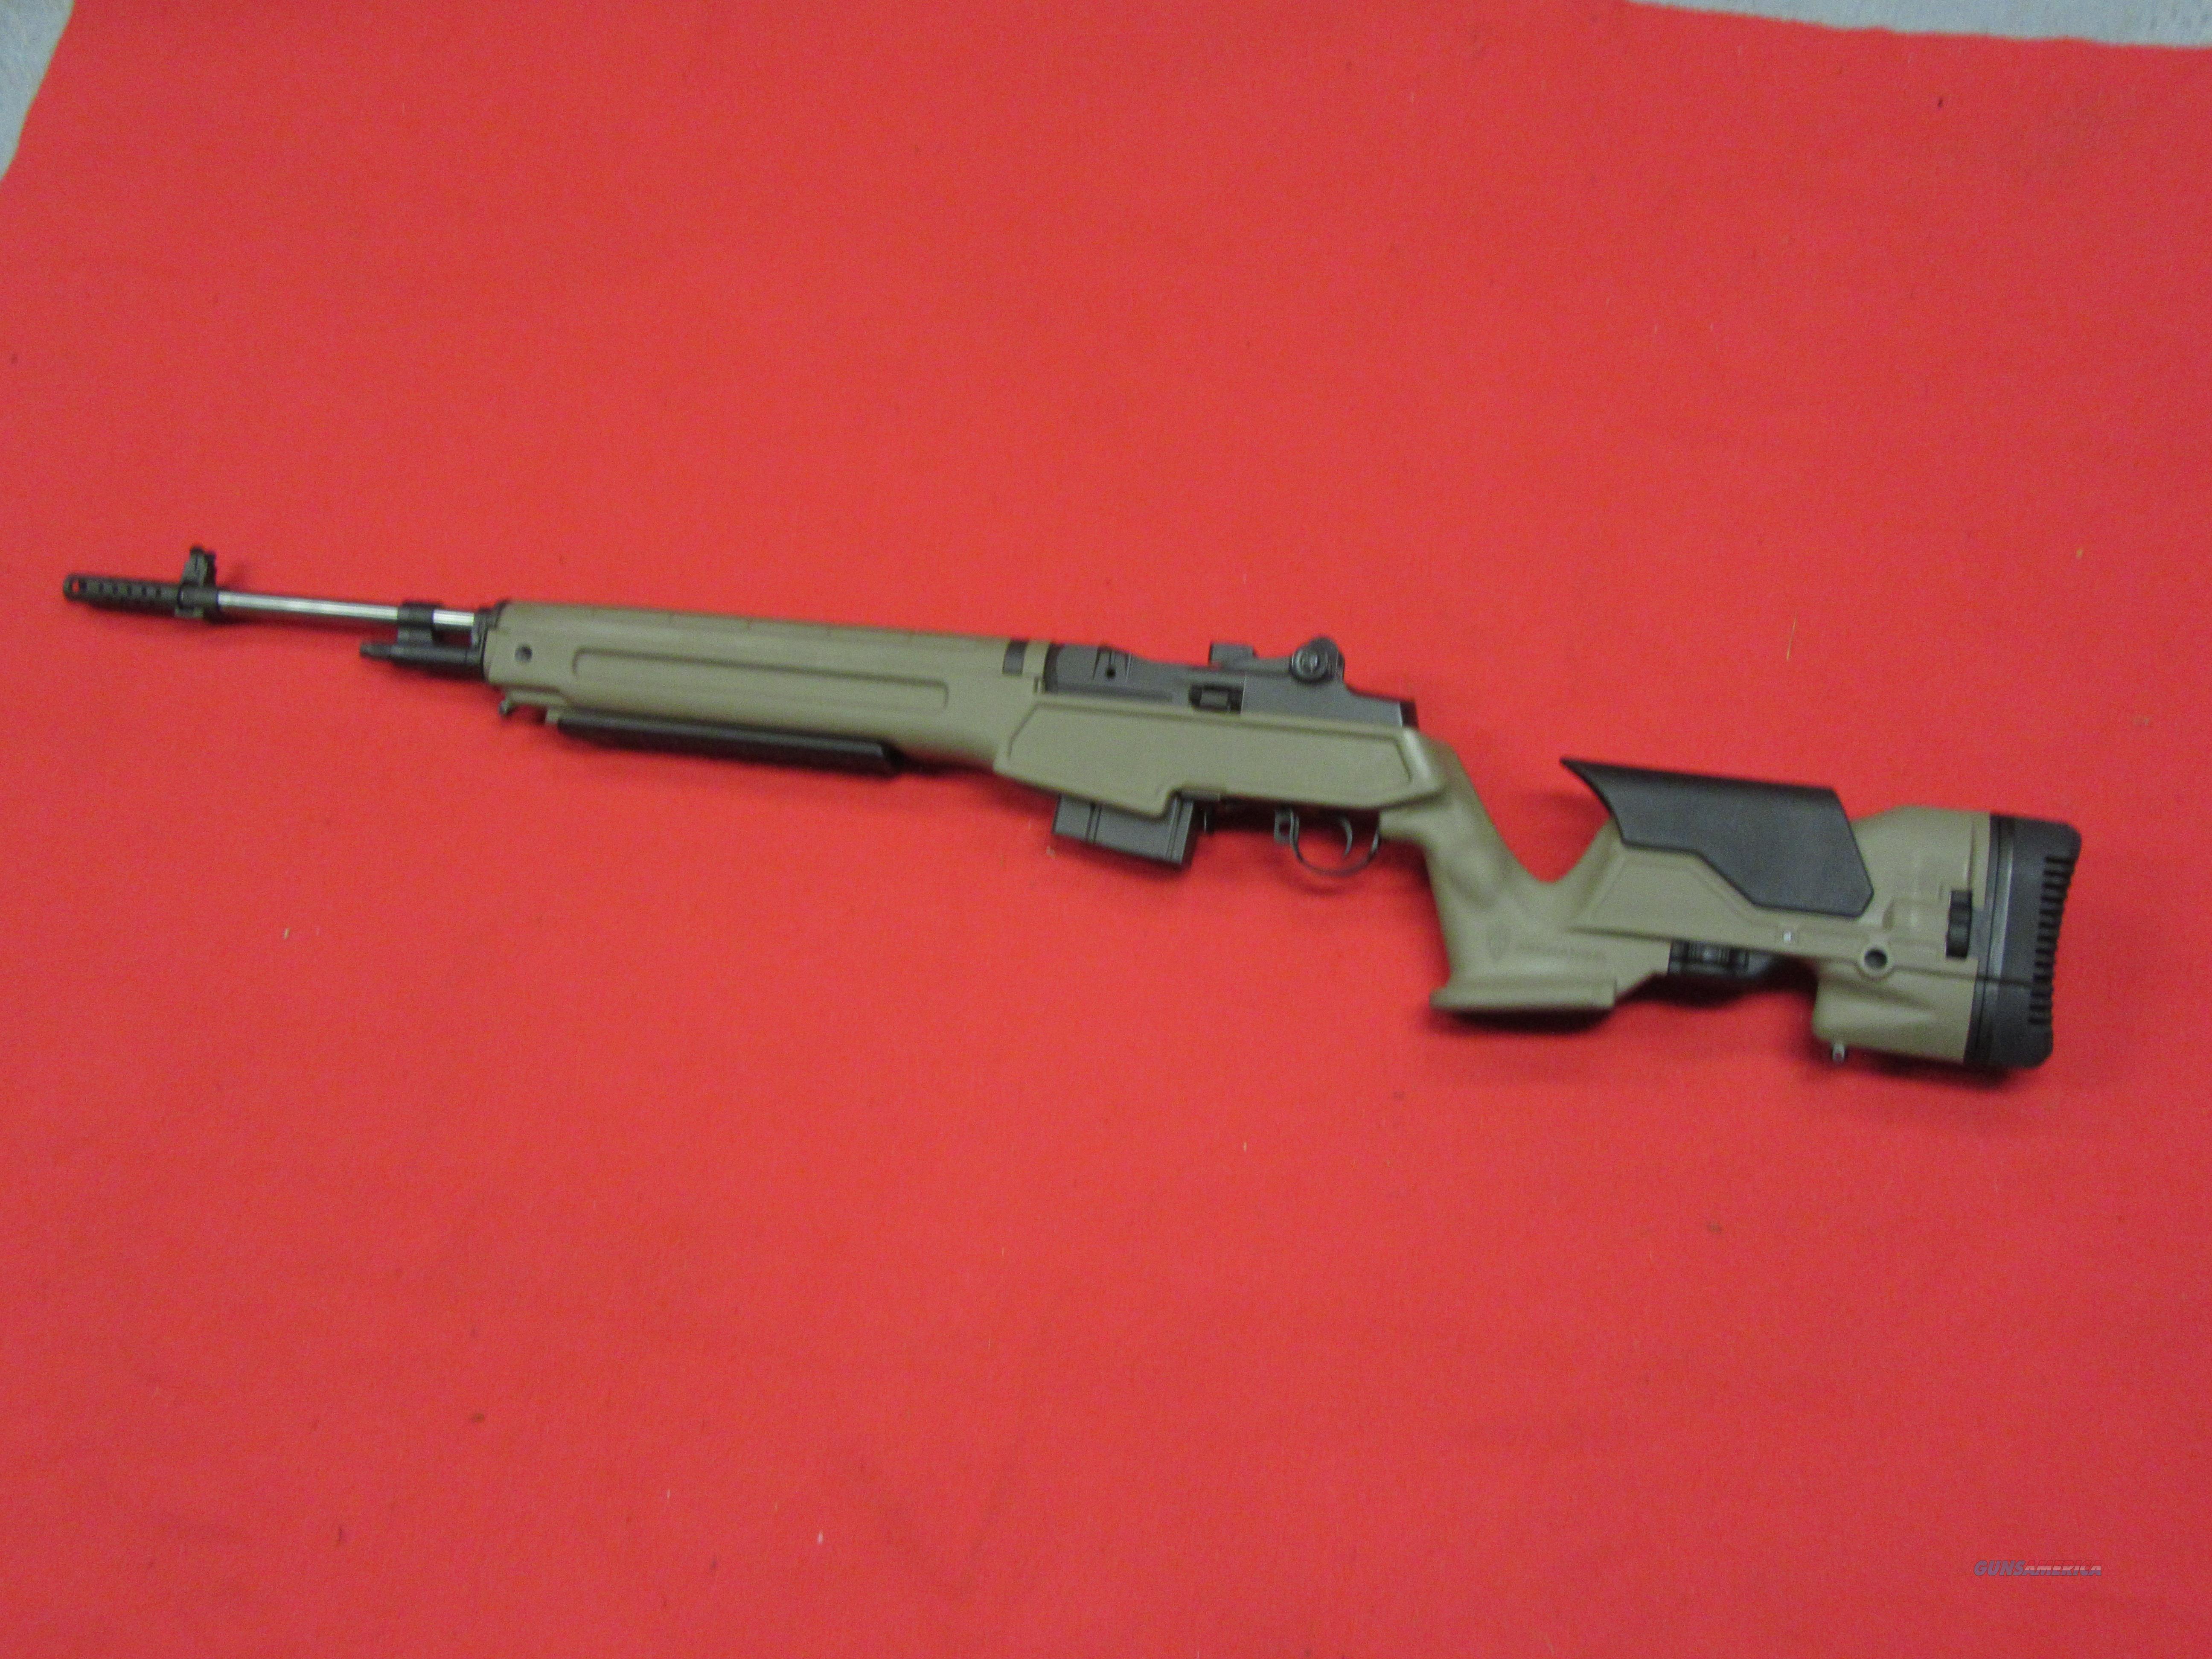 Springfield M1A 6,5 Creedmore - Never Fired  Guns > Rifles > Springfield Armory Rifles > M1A/M14